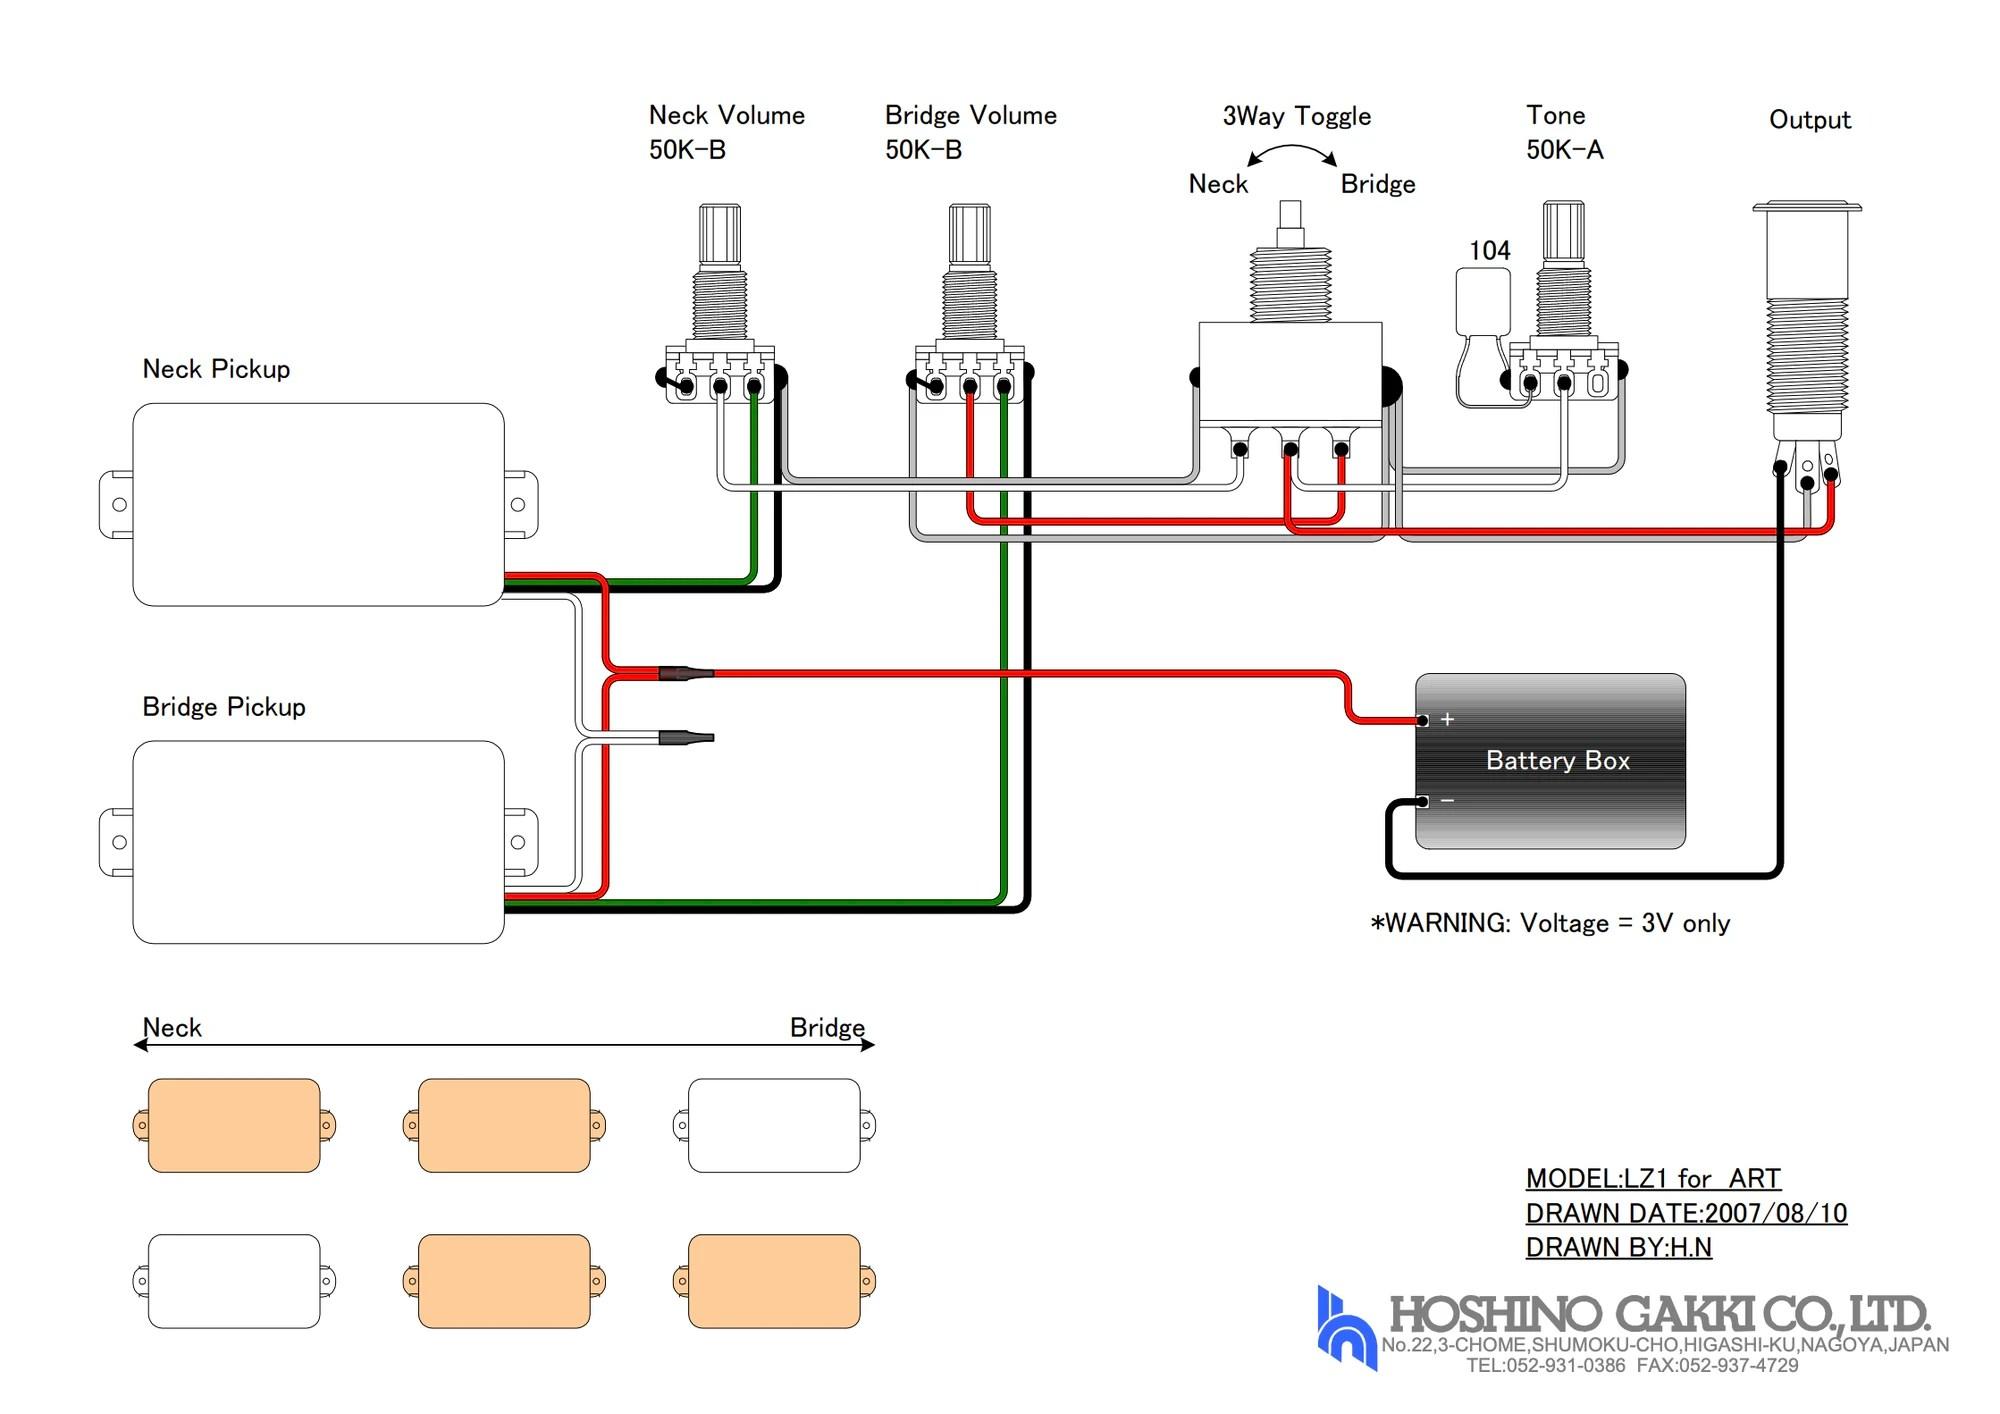 humbucker wiring diagram 320 art wiring diagram valueart 320 humbucker wiring diagram wiring diagram sessions art [ 2000 x 1414 Pixel ]